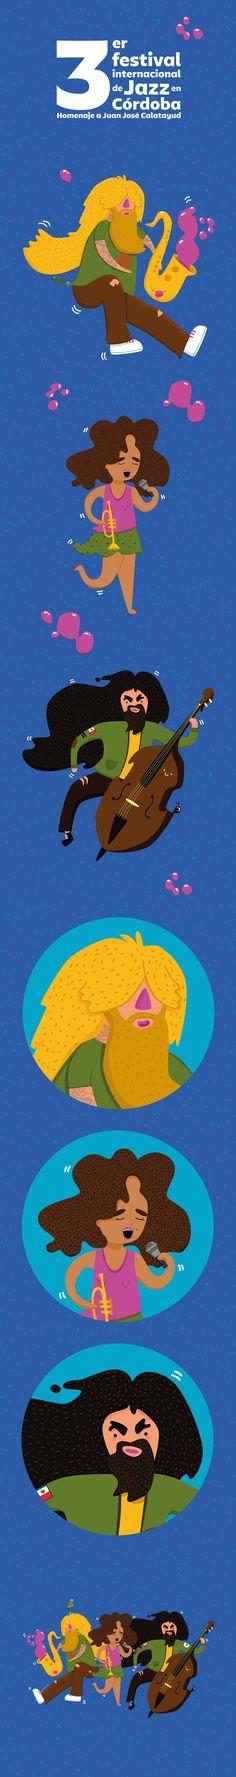 3 Festival Internacional de Jazz en Córdoba MX on Behance #festival #jazz #personajes #cordoba #andreahonni #ahonni #ilustracion #ilustration #music